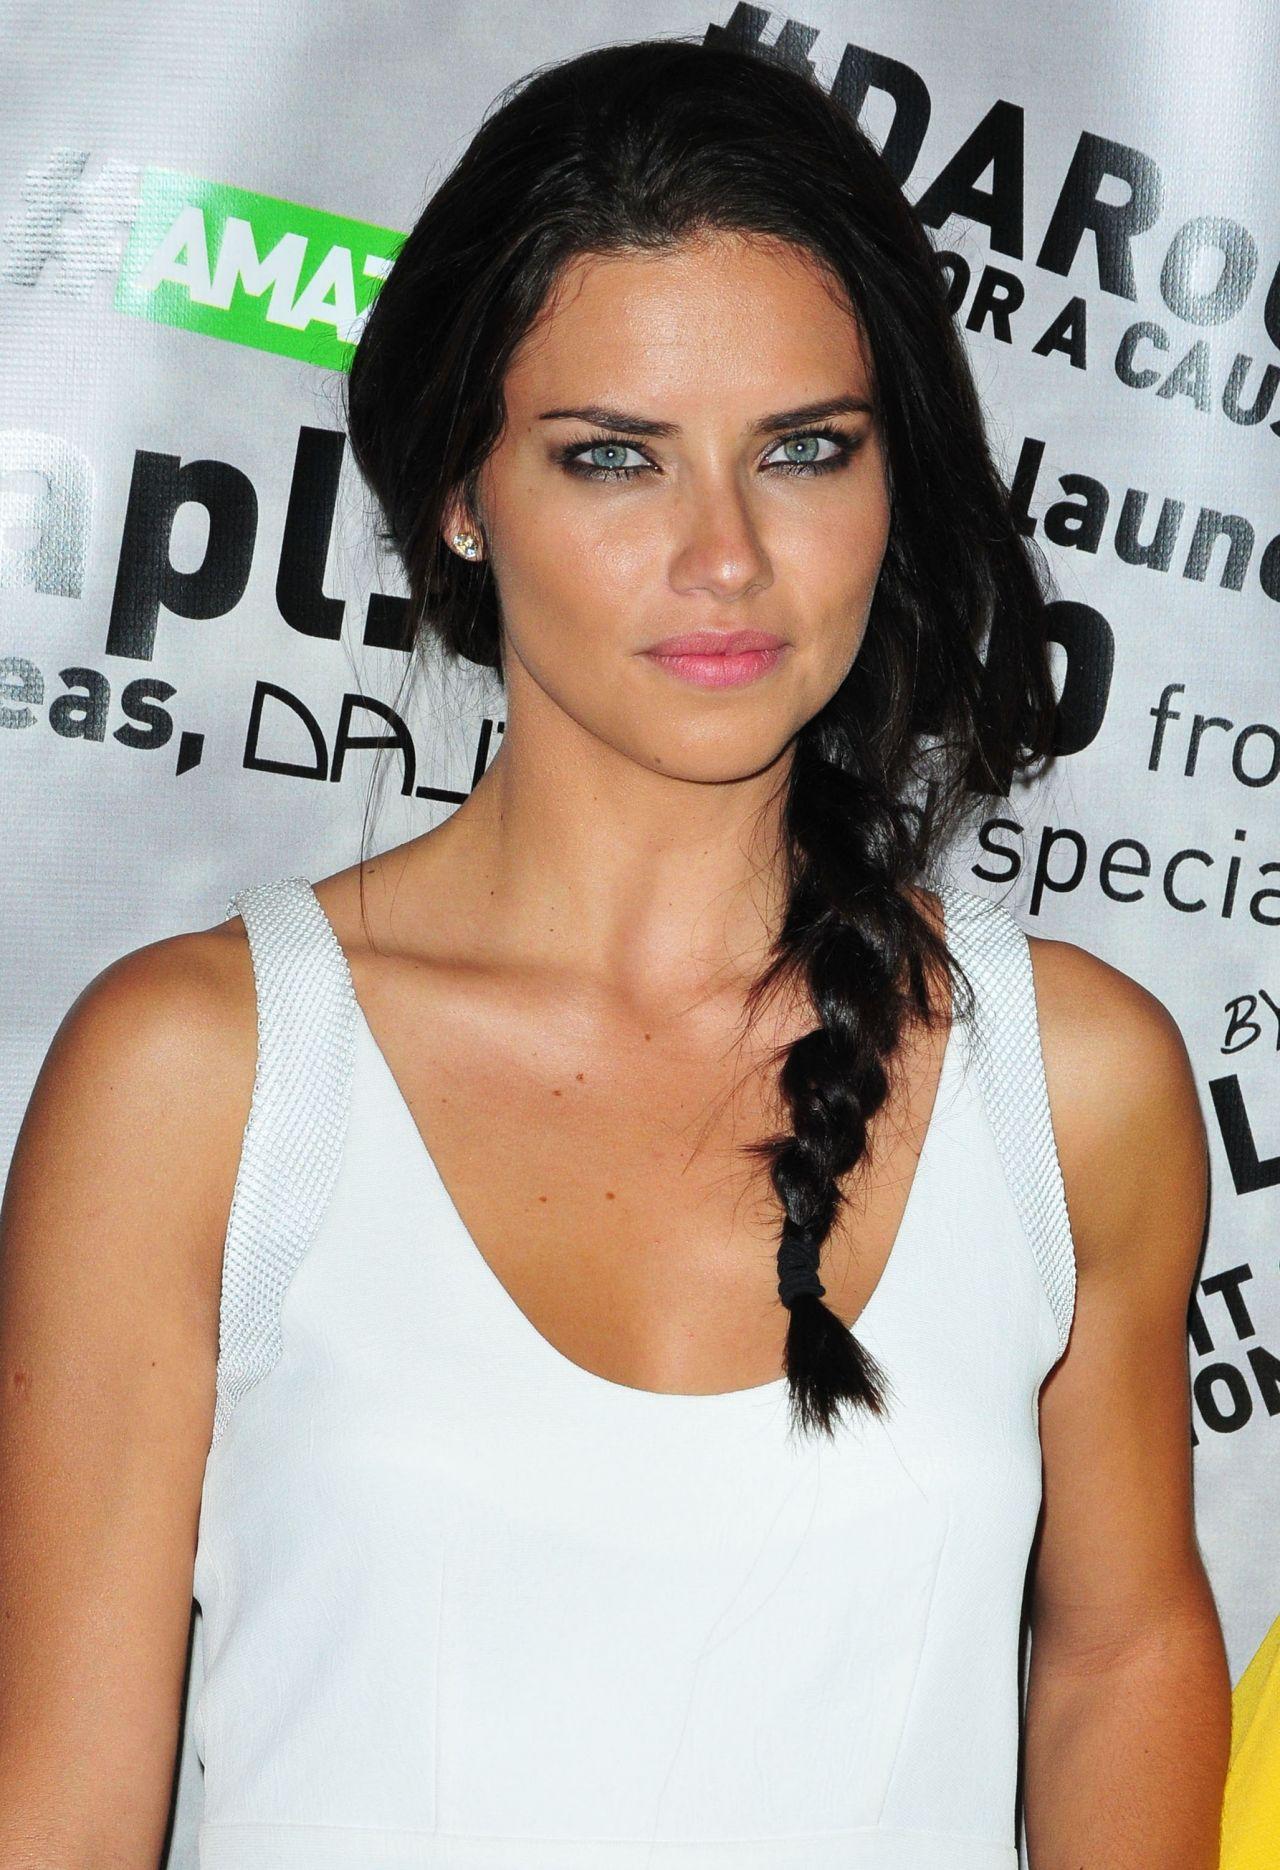 Adriana lima hairstyles 2014 - Adriana Lima Amazonia Beverages Urban Jungle Campaign Kickoff May 2014